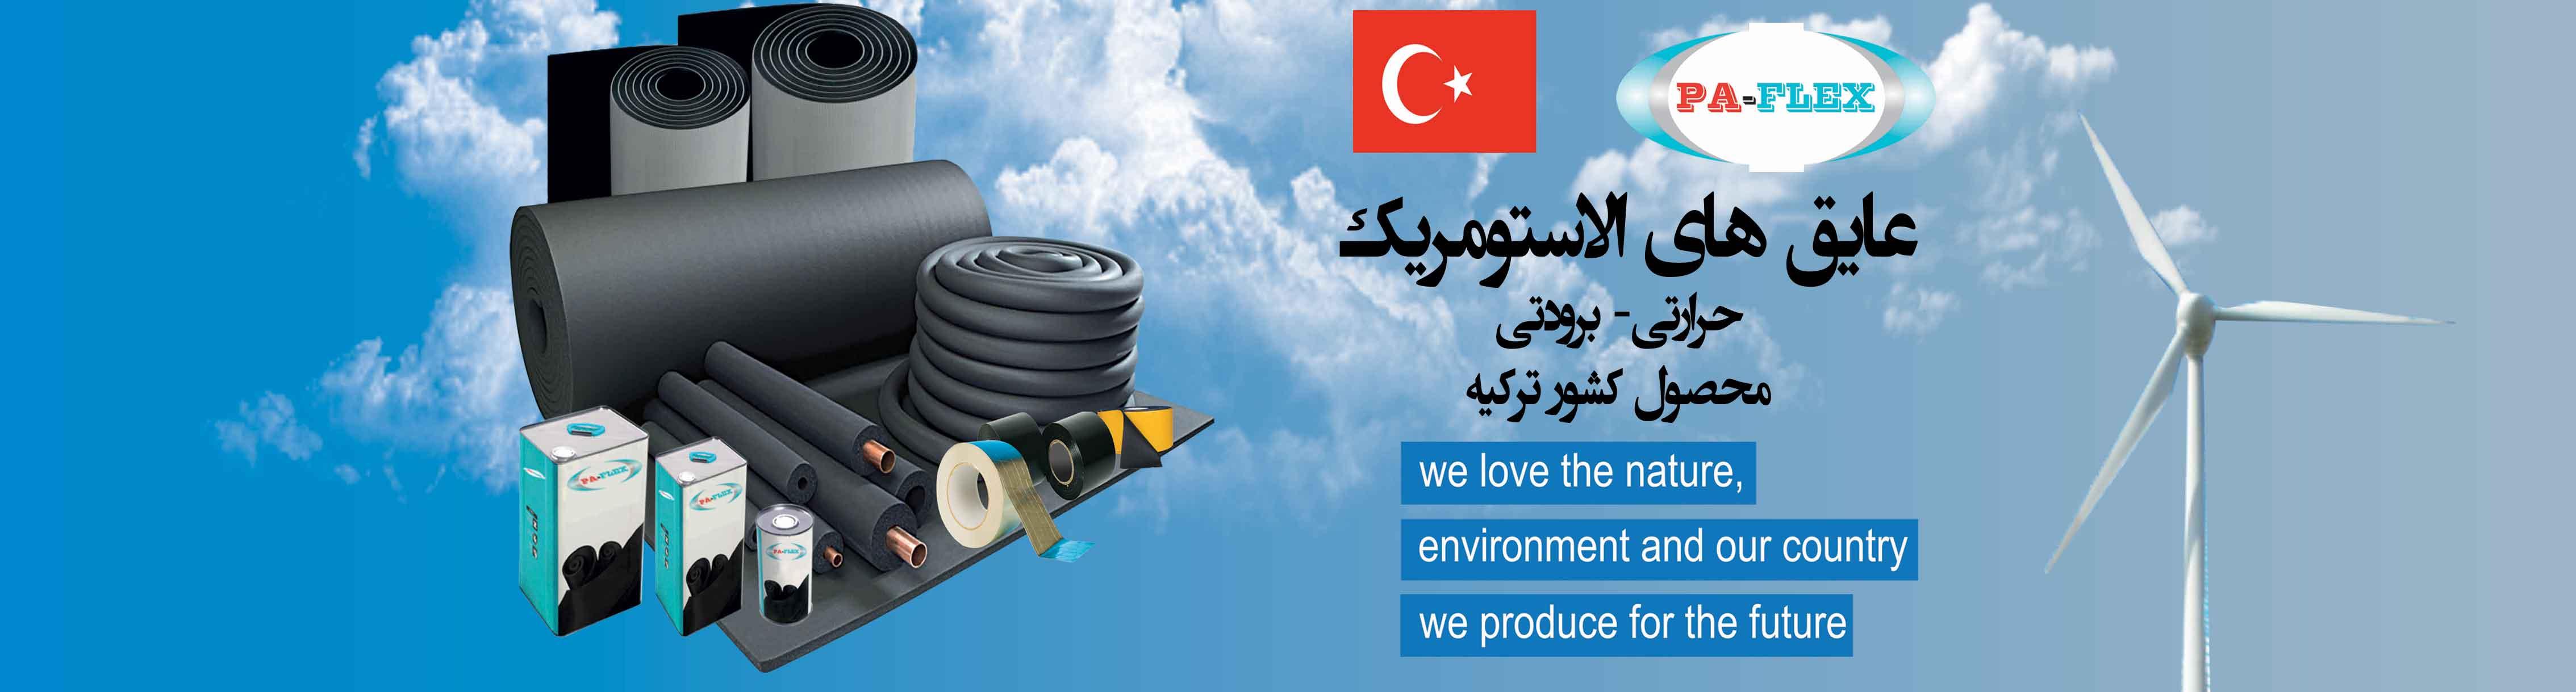 عایق الاستومری پافلکس ترکیه